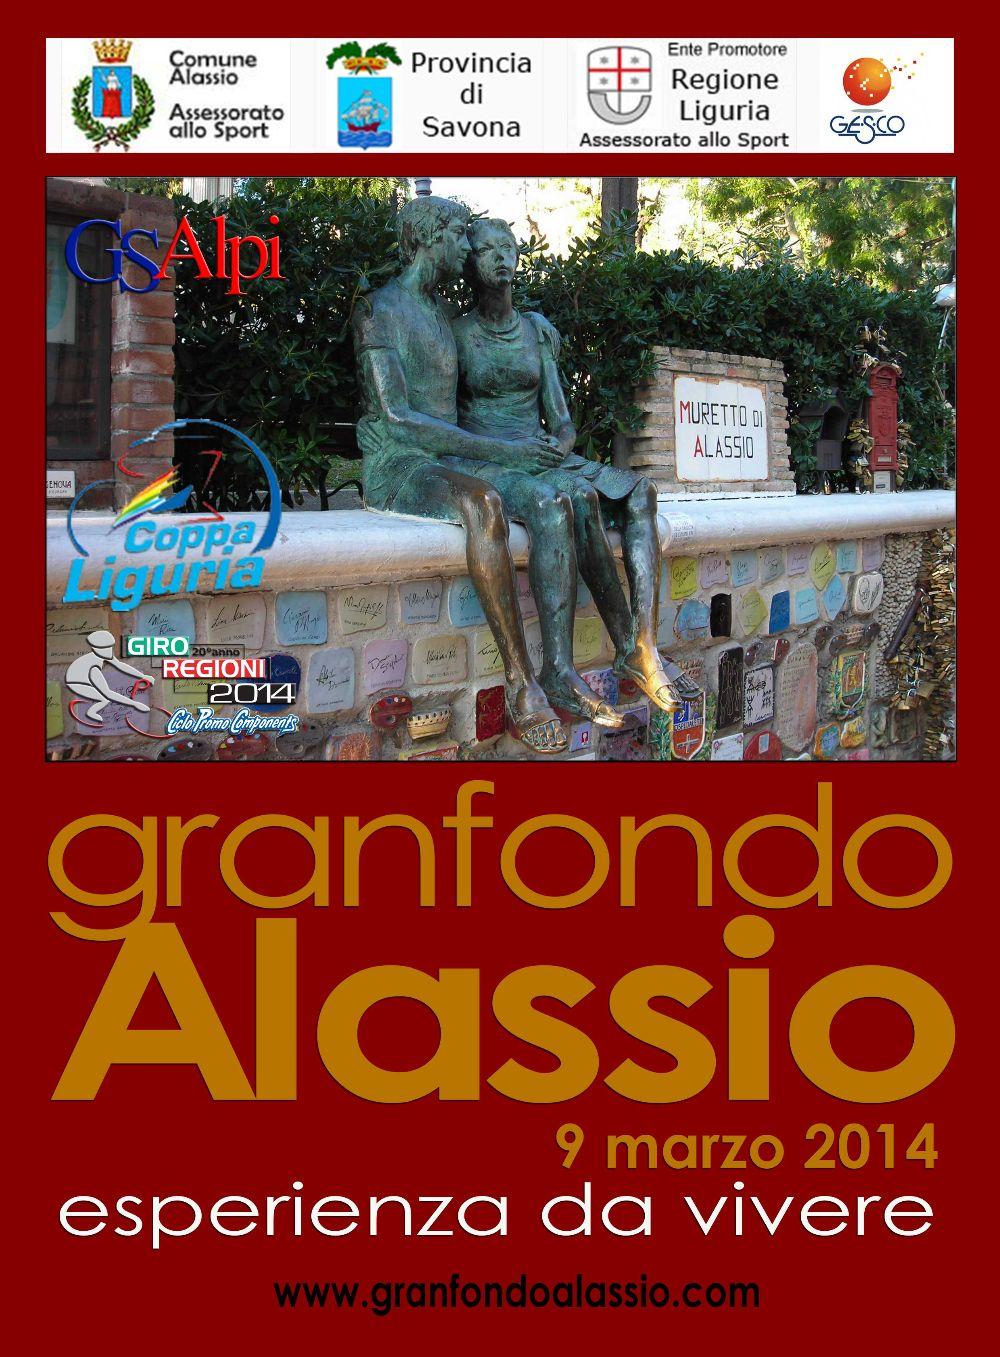 Promo-Alassio